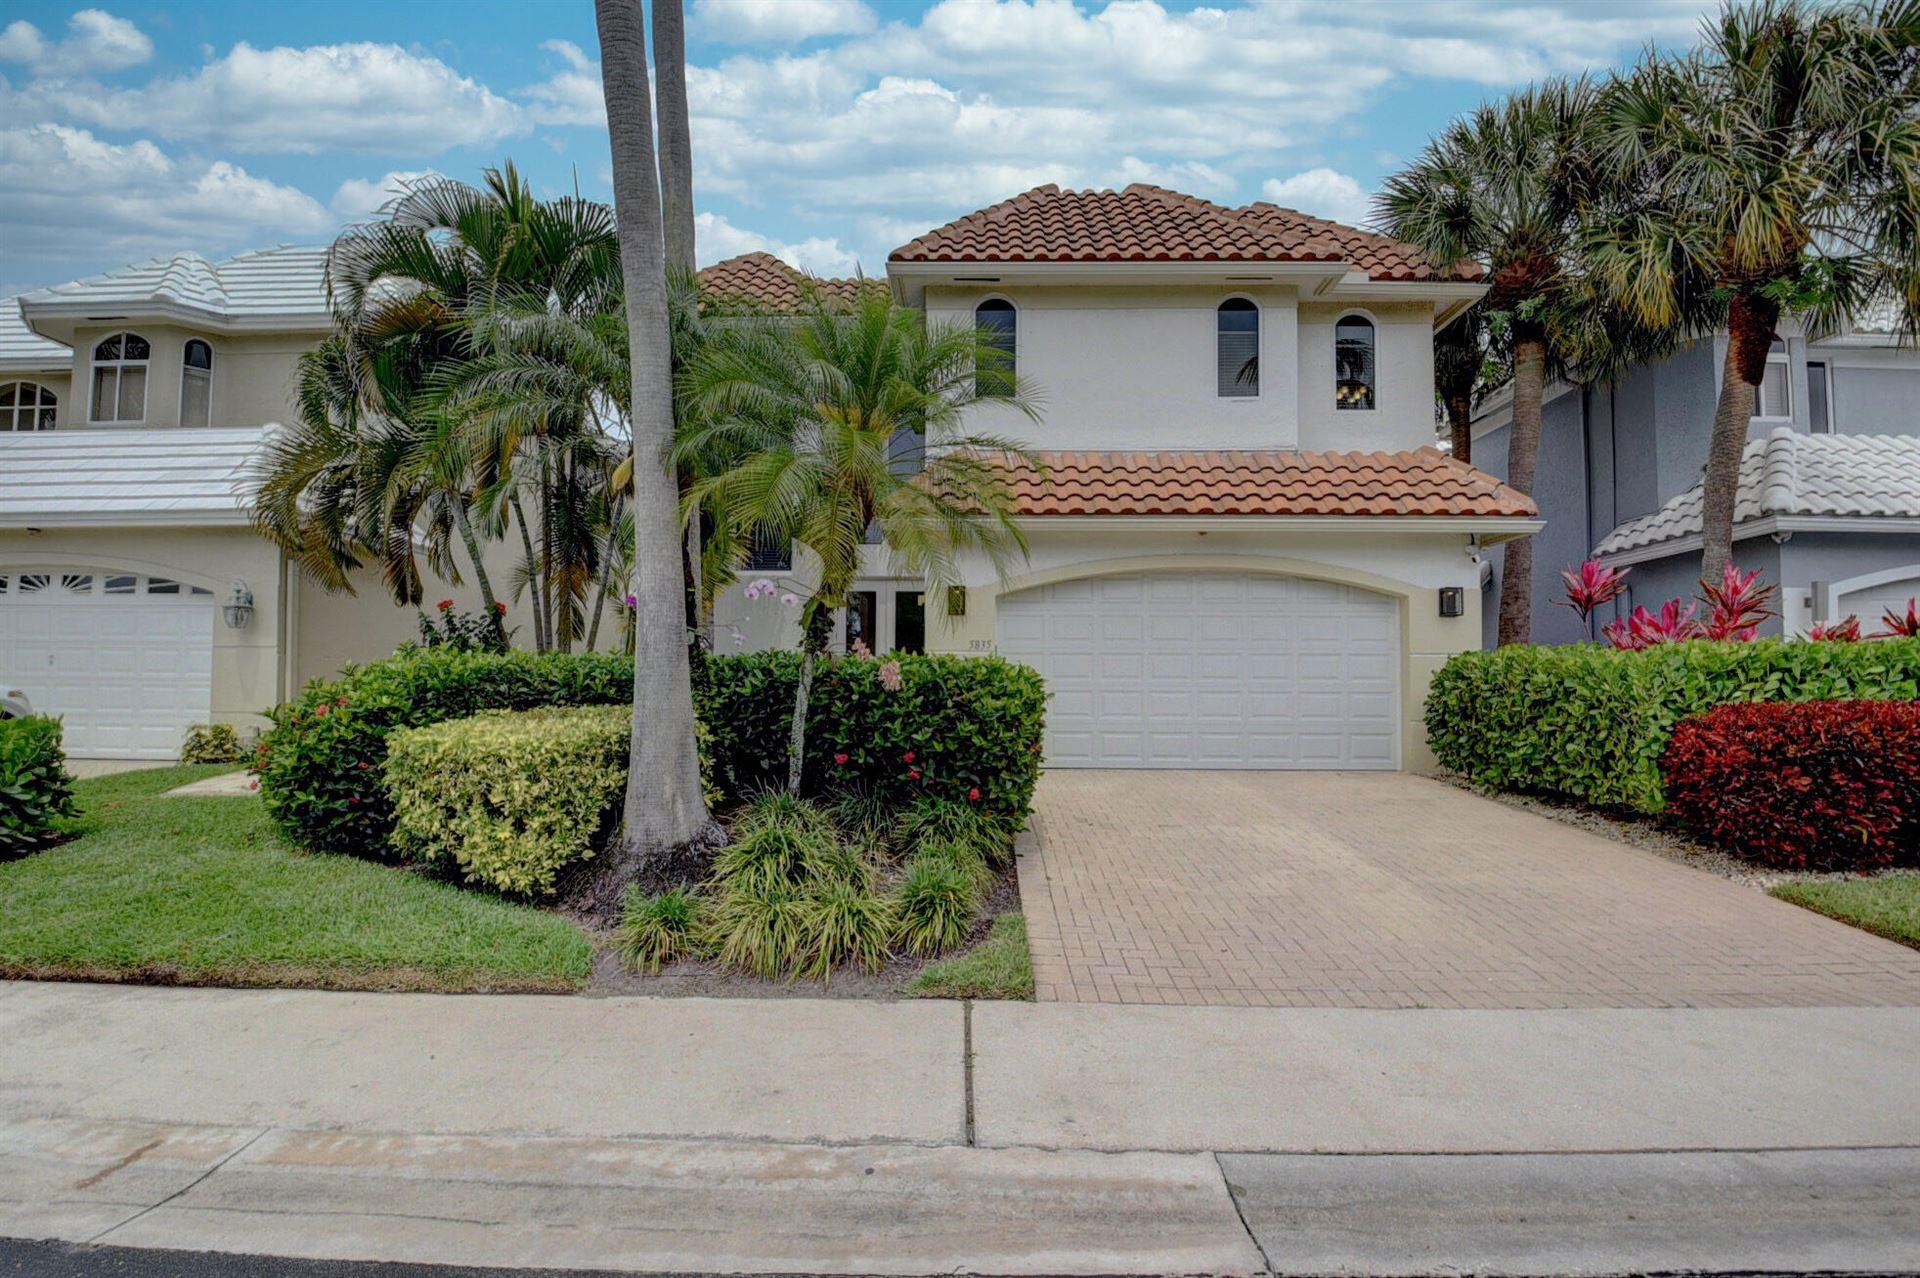 5835 NW 42nd Way, Boca Raton, FL 33496 - MLS#: RX-10710294